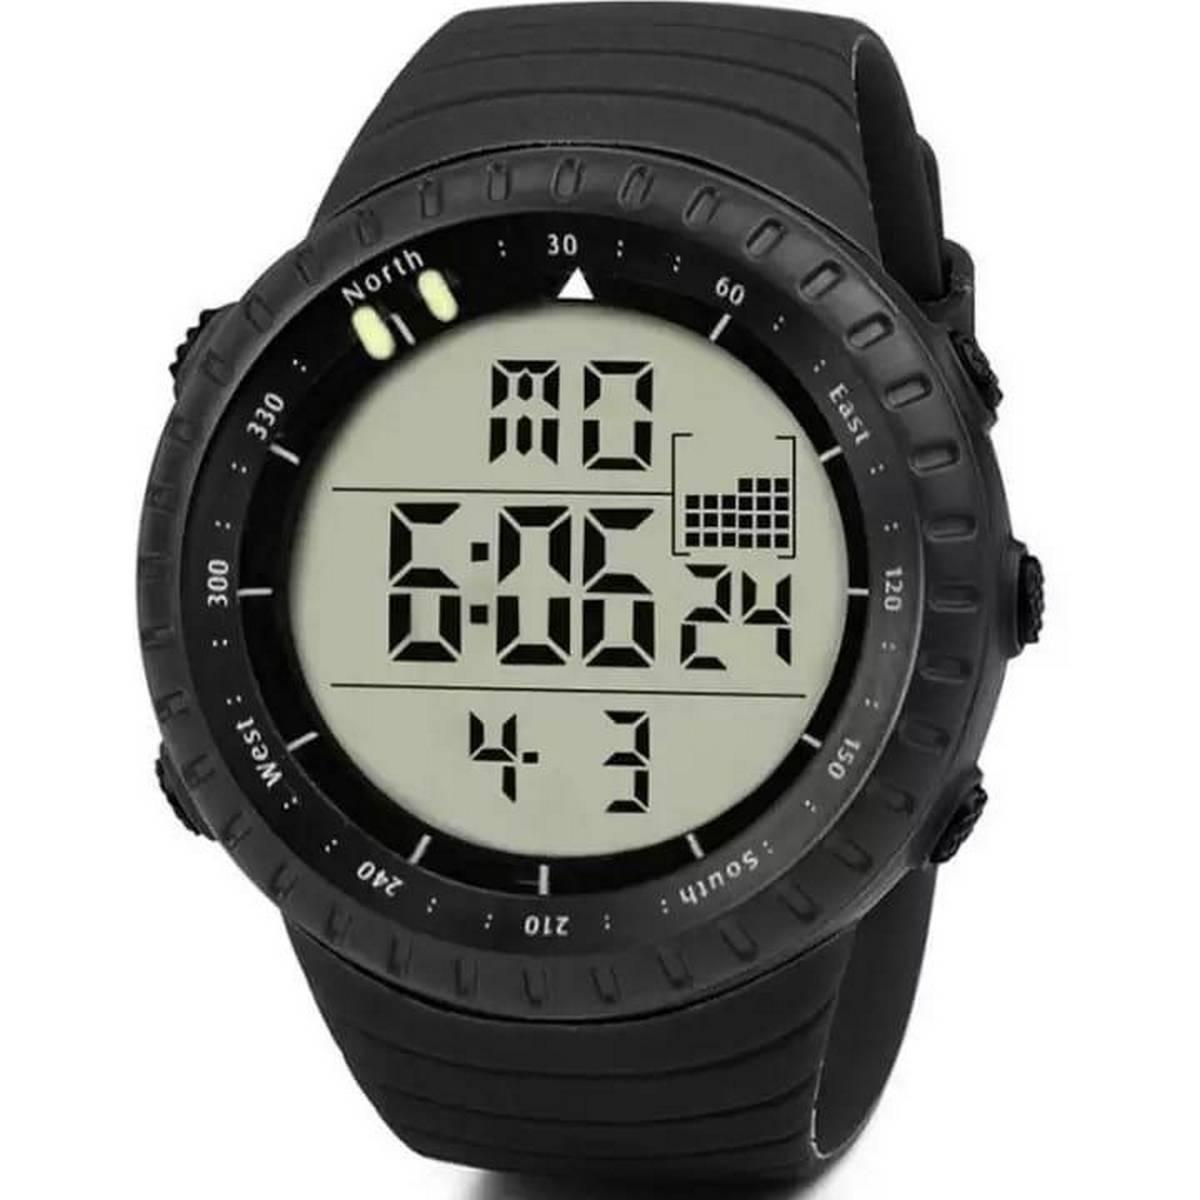 SUUNTO Wrist Watch For Men